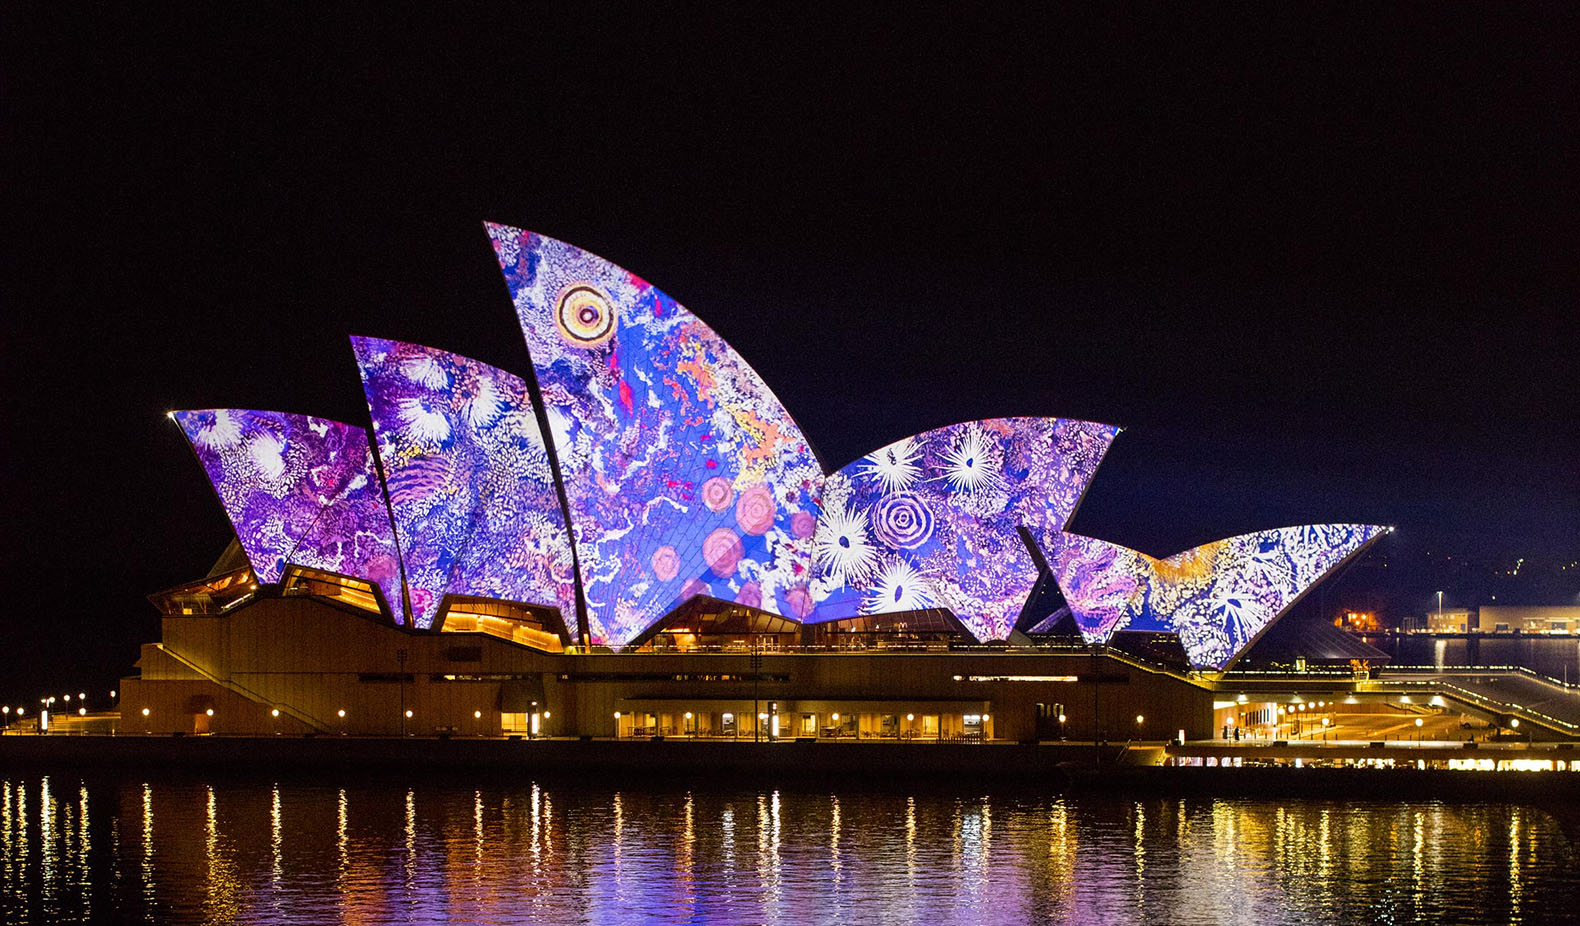 2016 VIVID Festival, Sydney, Australia